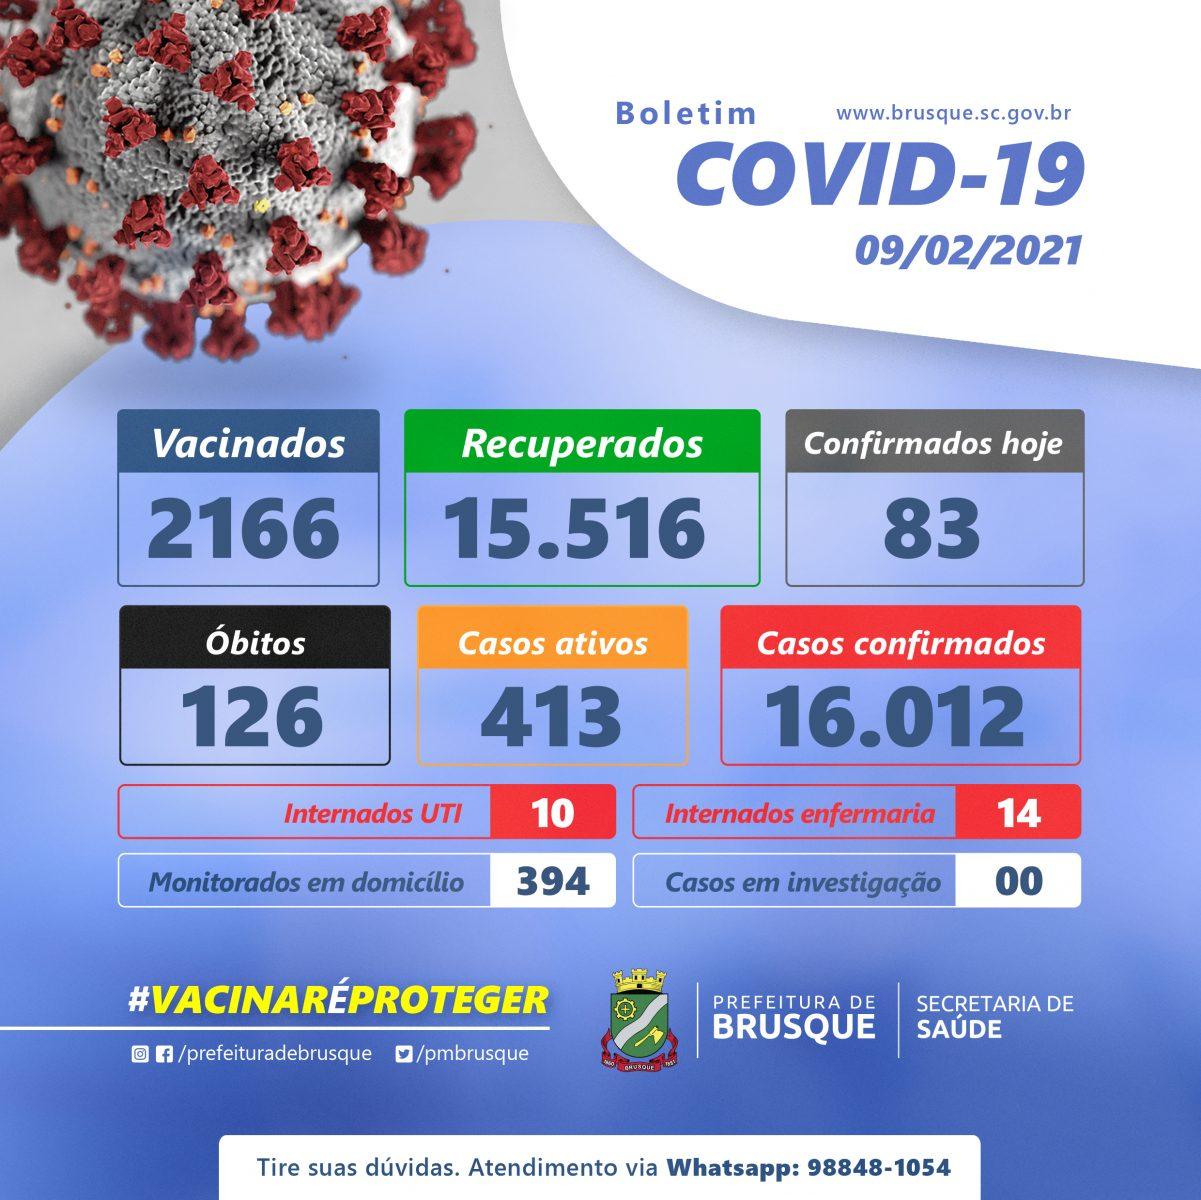 Covid-19: Confira o boletim epidemiológico desta terça-feira (9)